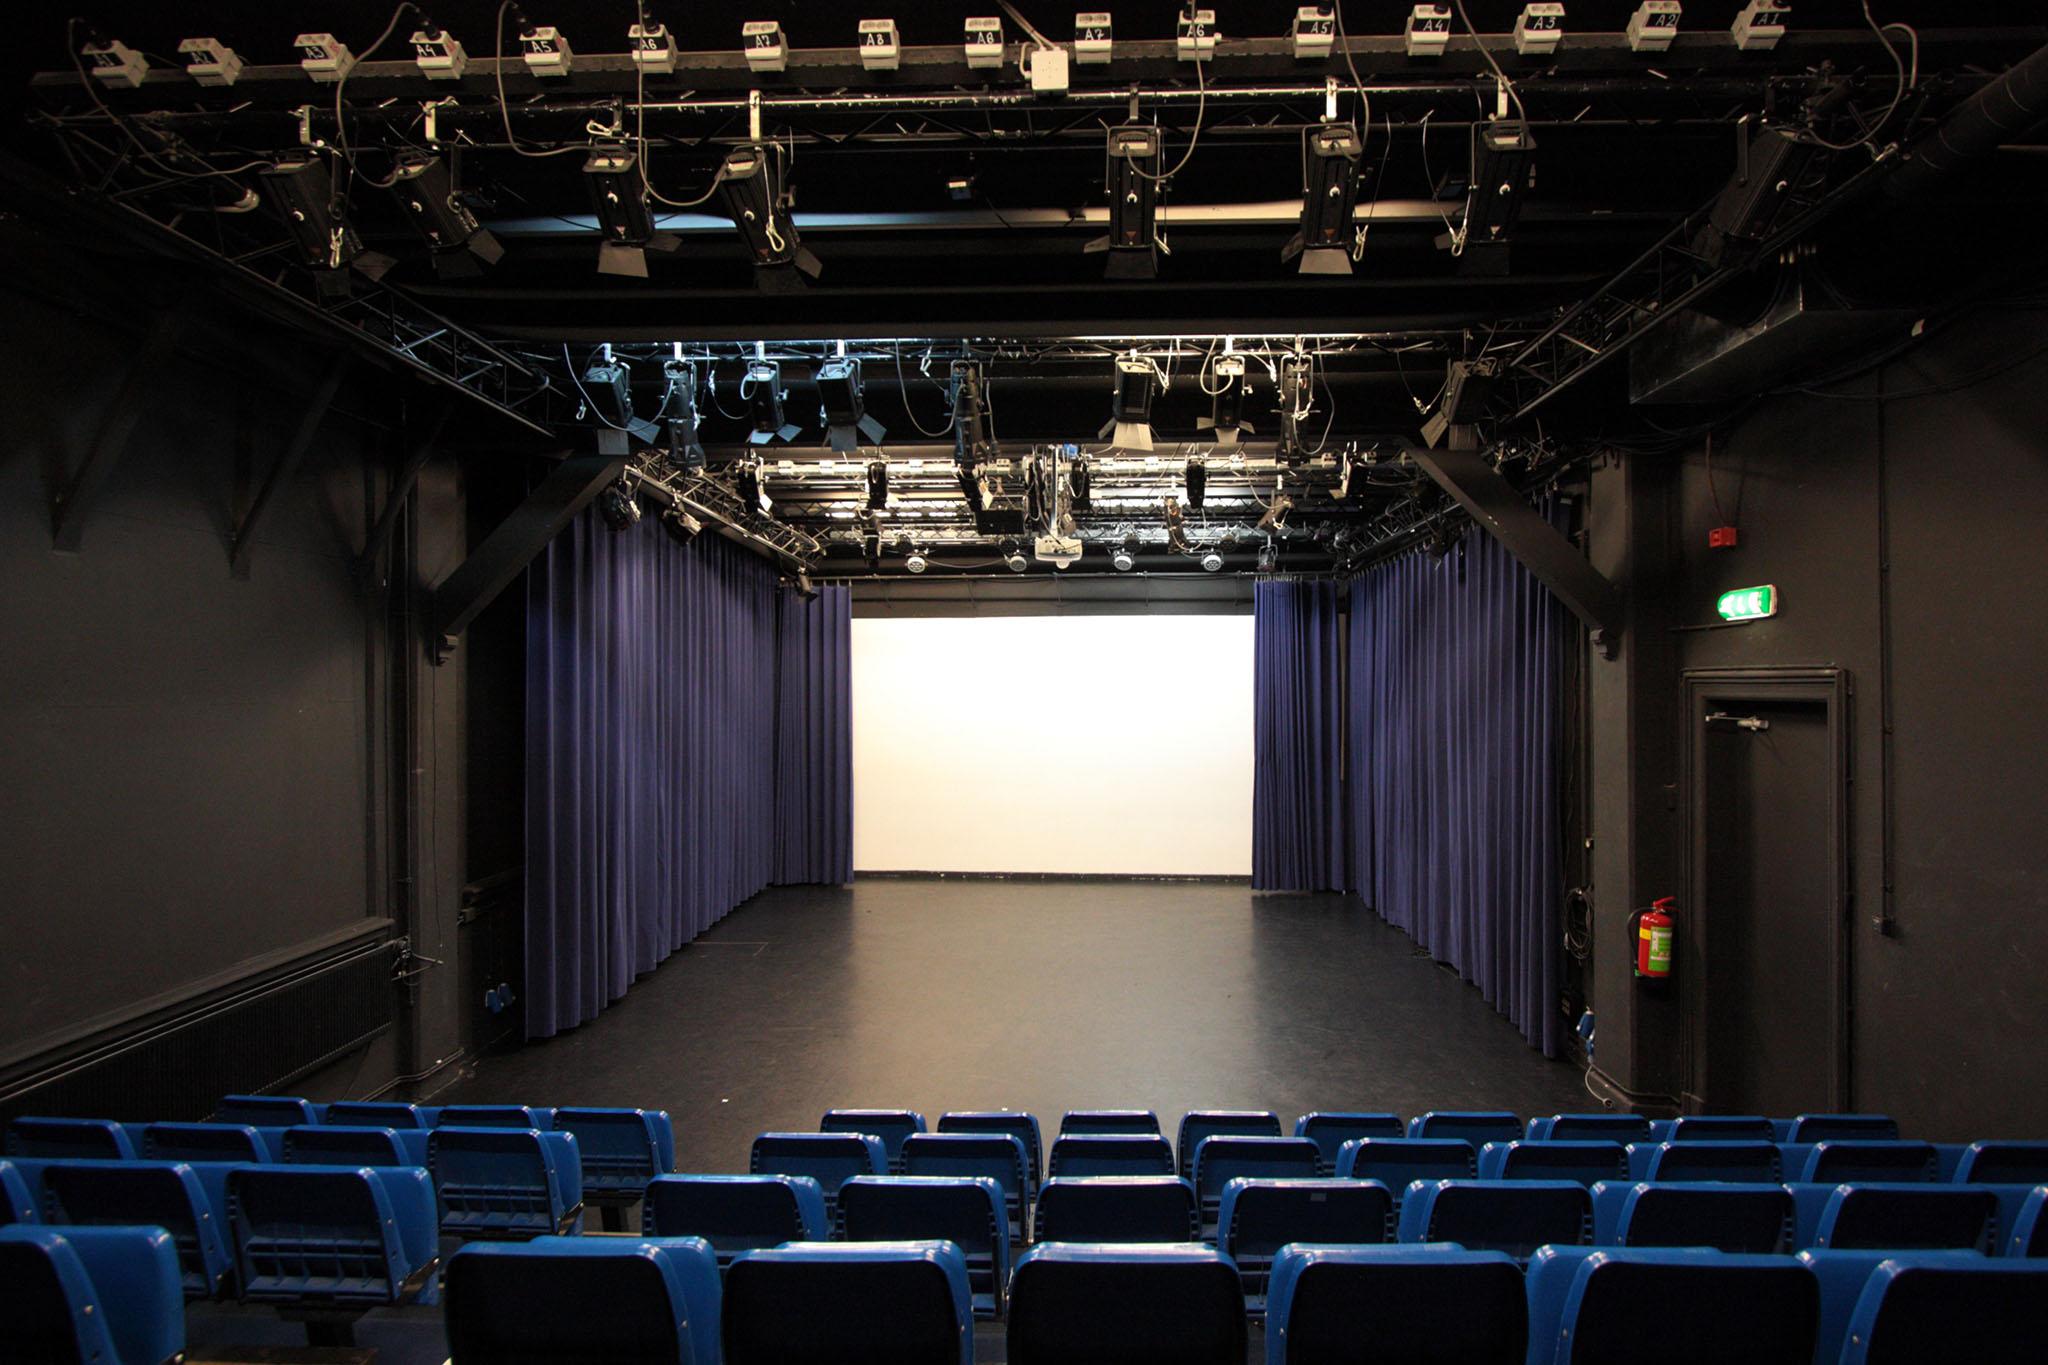 ZIMIHC theater bedrijfsfotografie Wittevrouwen zaal